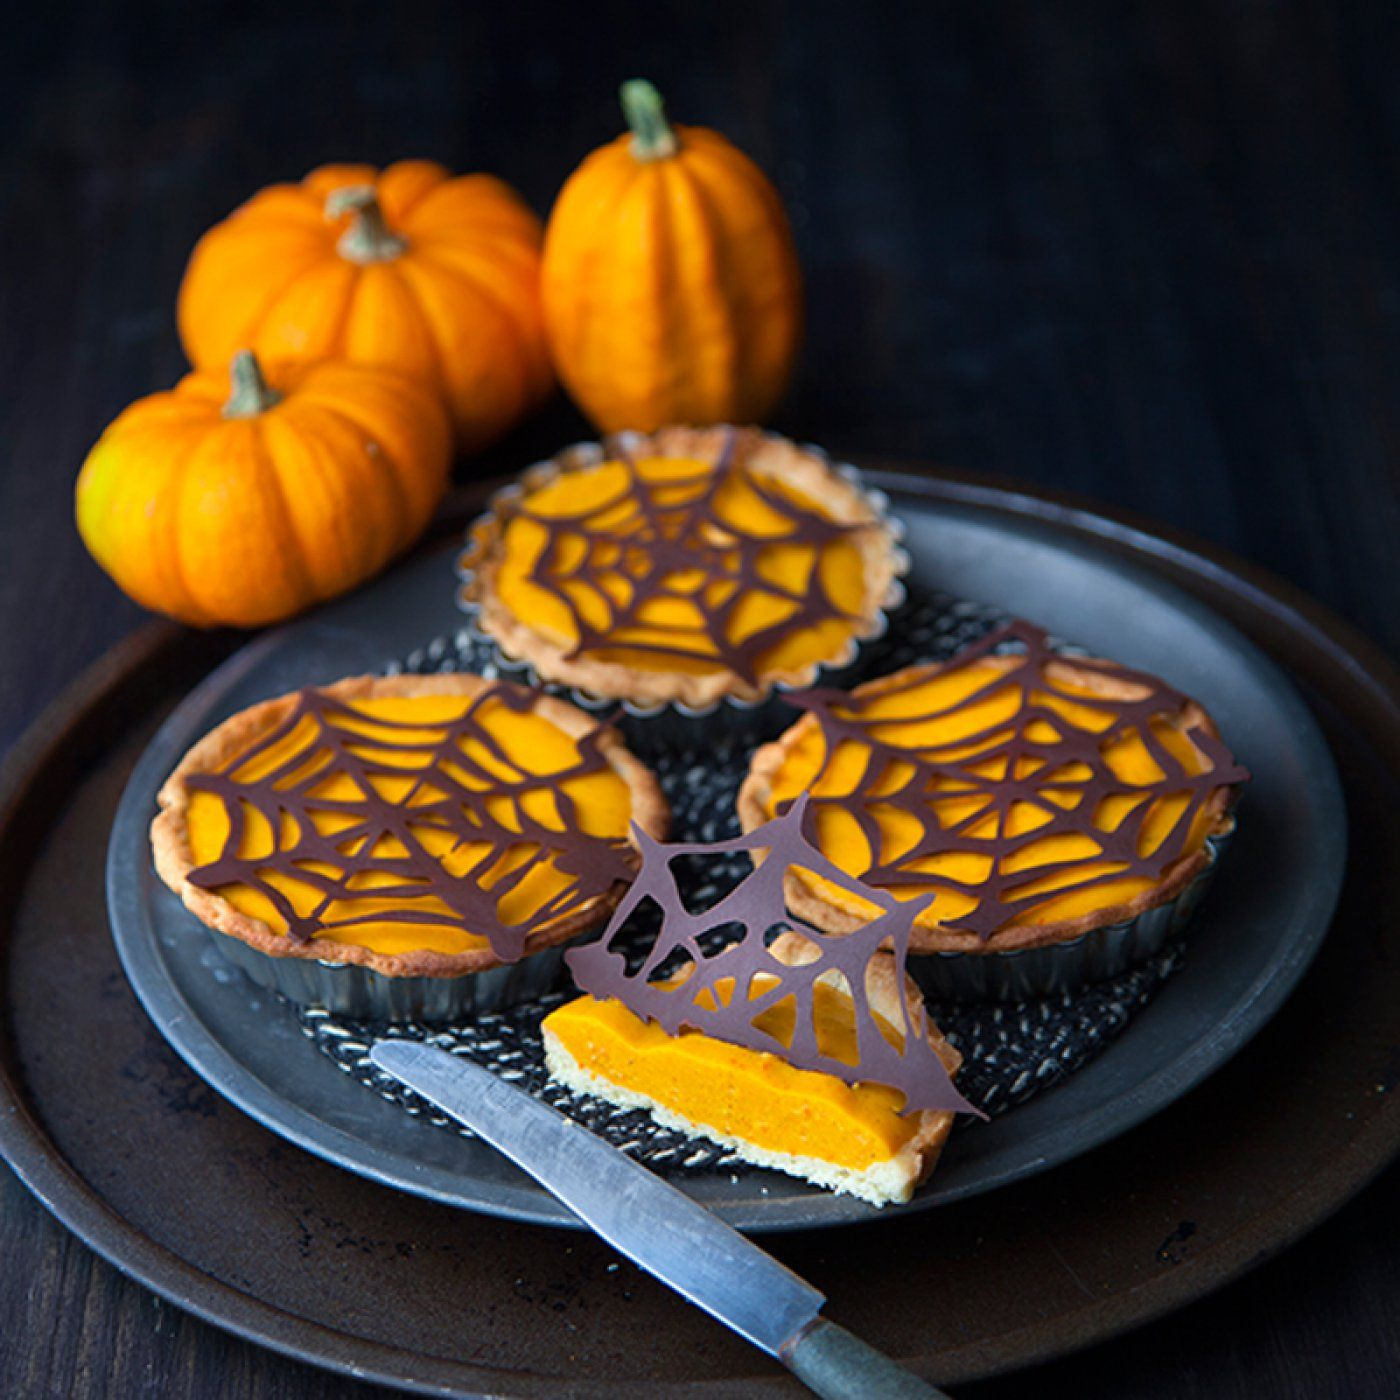 Cuisine Créative Recettes Originales Pour Halloween - Cuisine testee